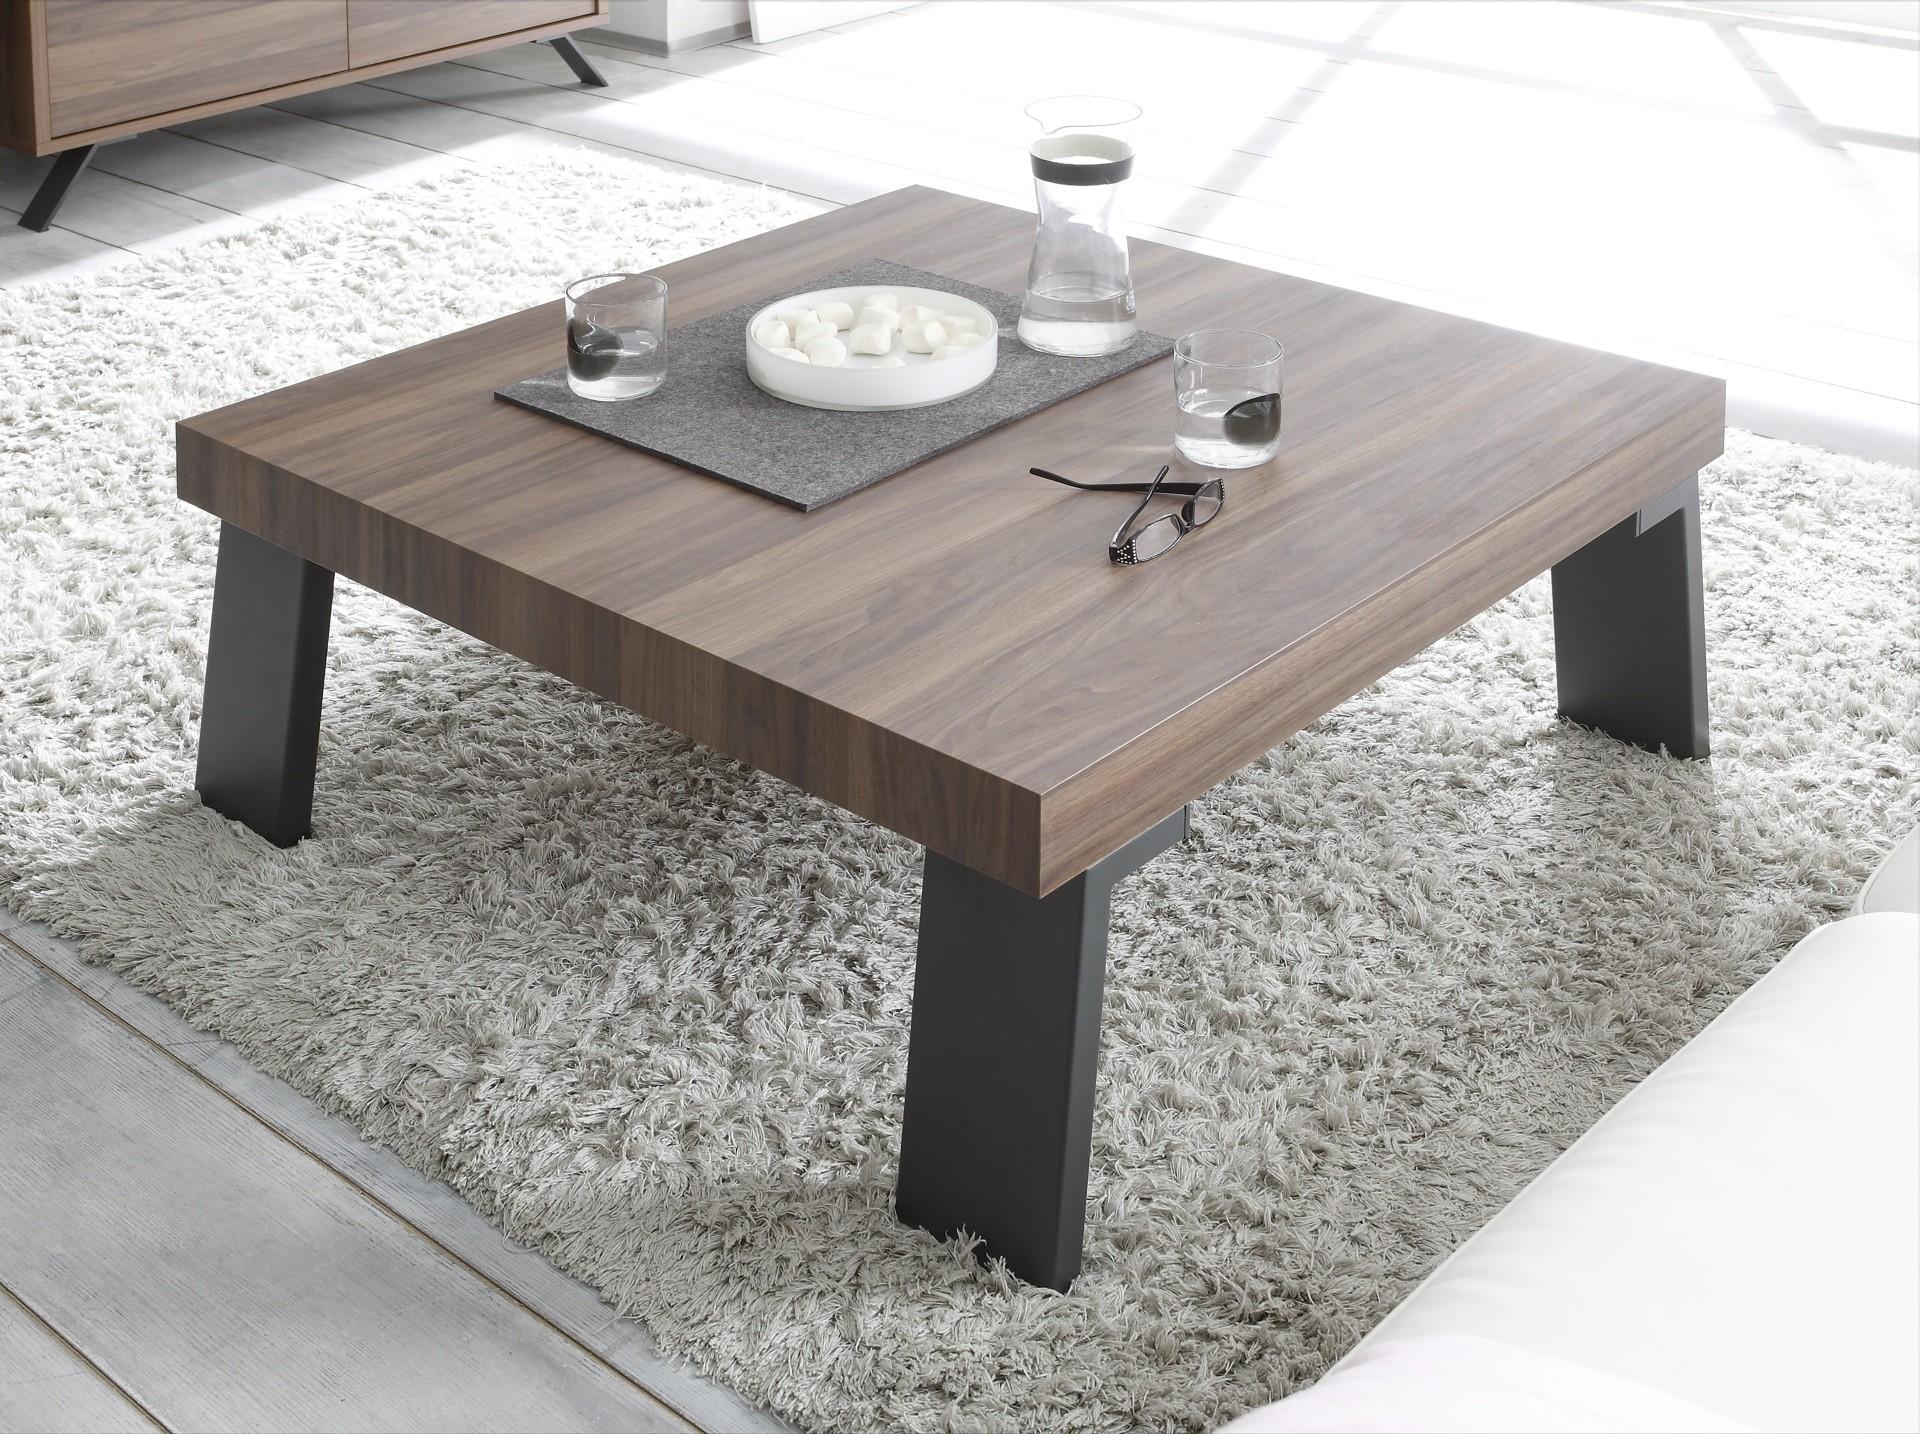 Parma Dark Walnut Coffee Table With Steel Legs   Coffee Tables   Sena Home  Furniture